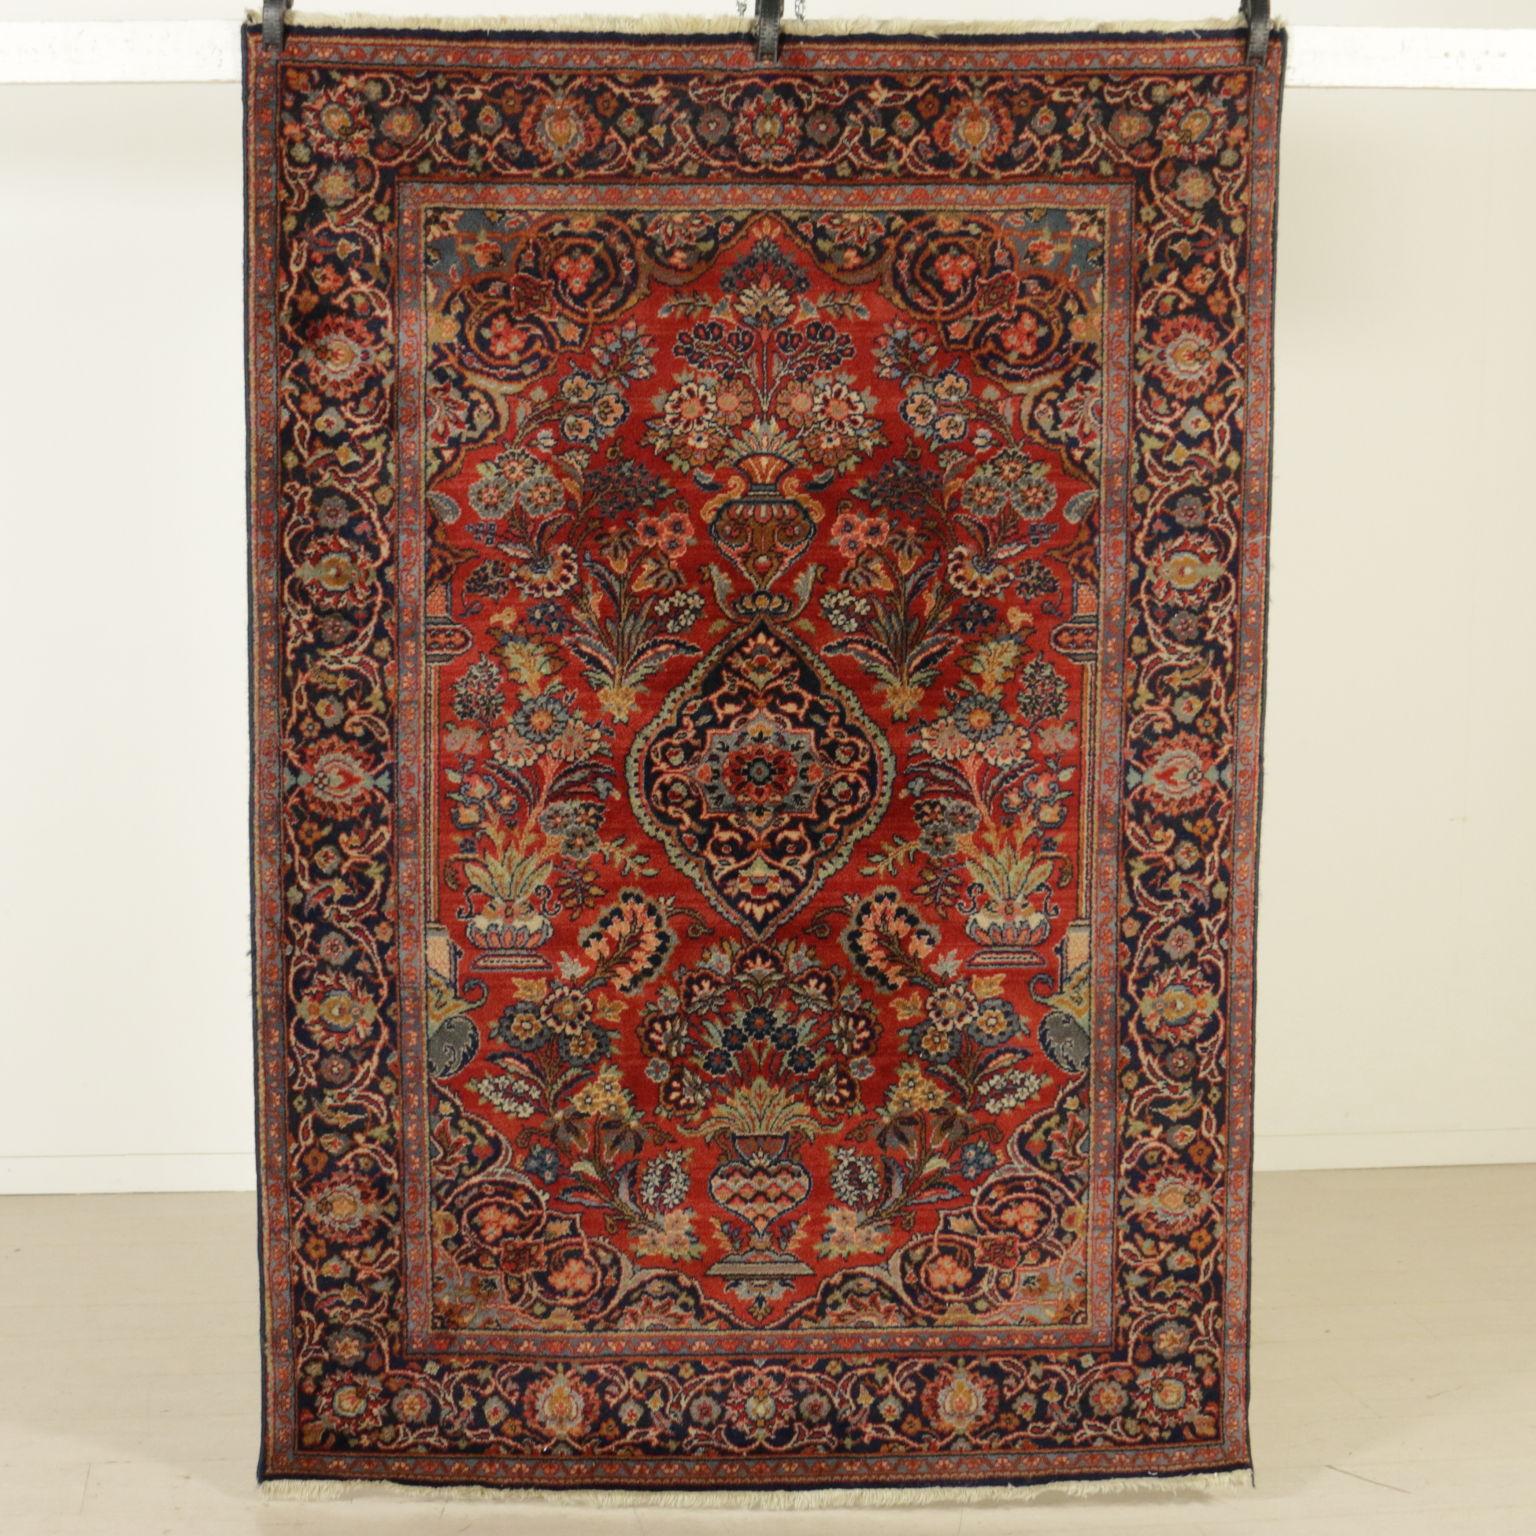 Alfombra de kashan india alfombras antiguedades for Alfombras indias